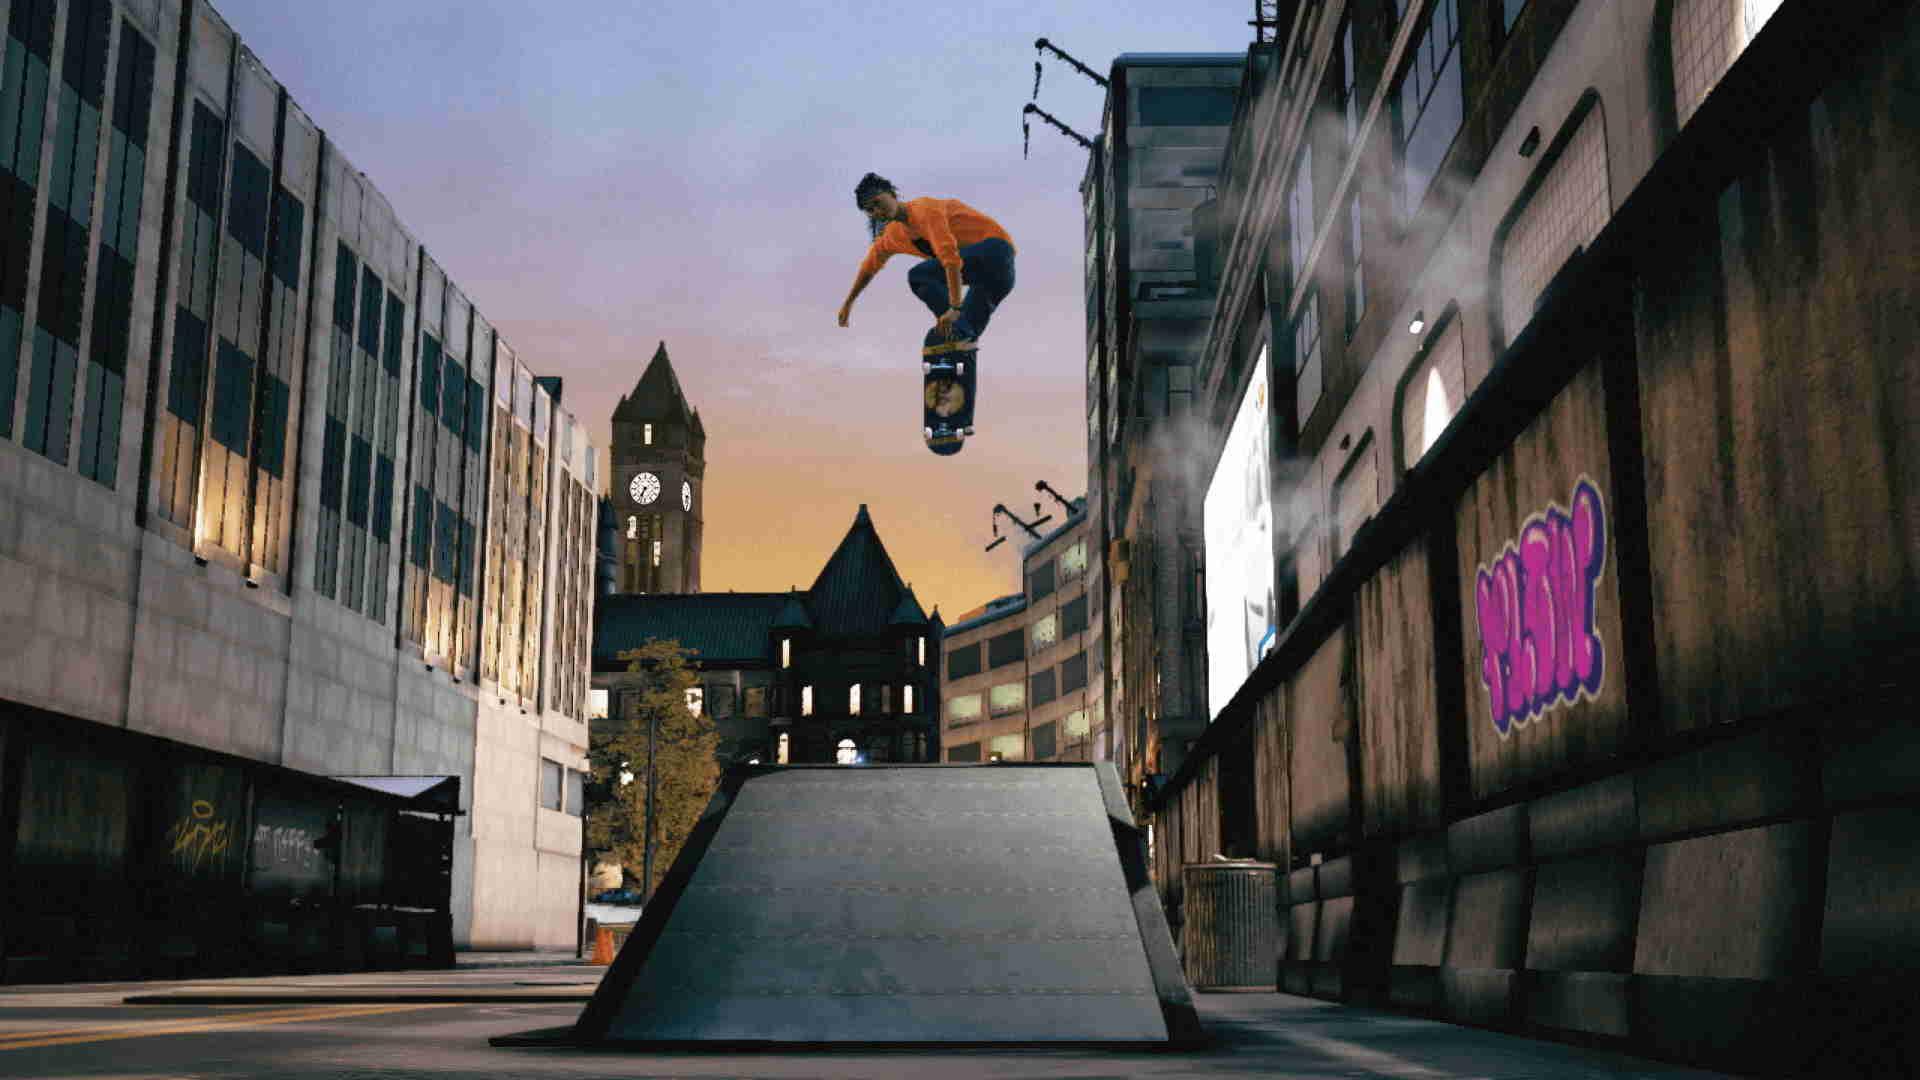 Tony Hawk's Pro Skater 1 + 2 Switch review: nostalgia